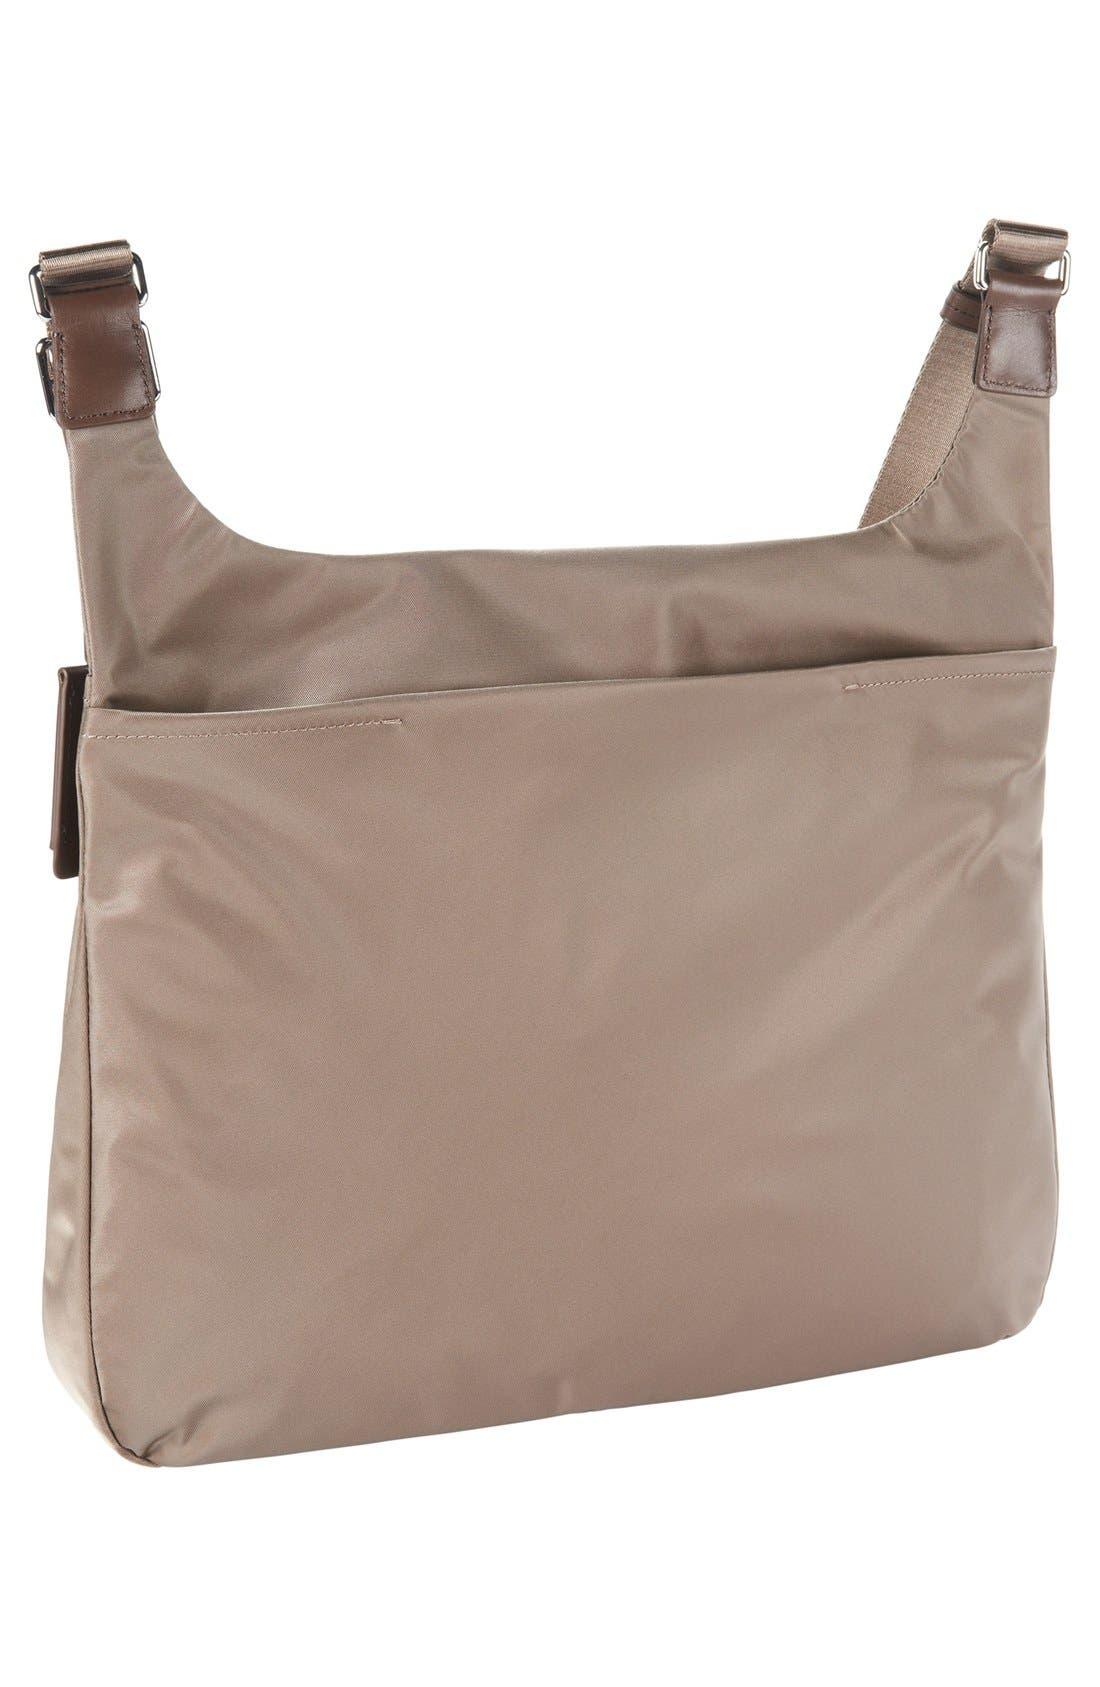 Alternate Image 3  - Tumi 'Voyager - Sumatra' Crossbody Bag